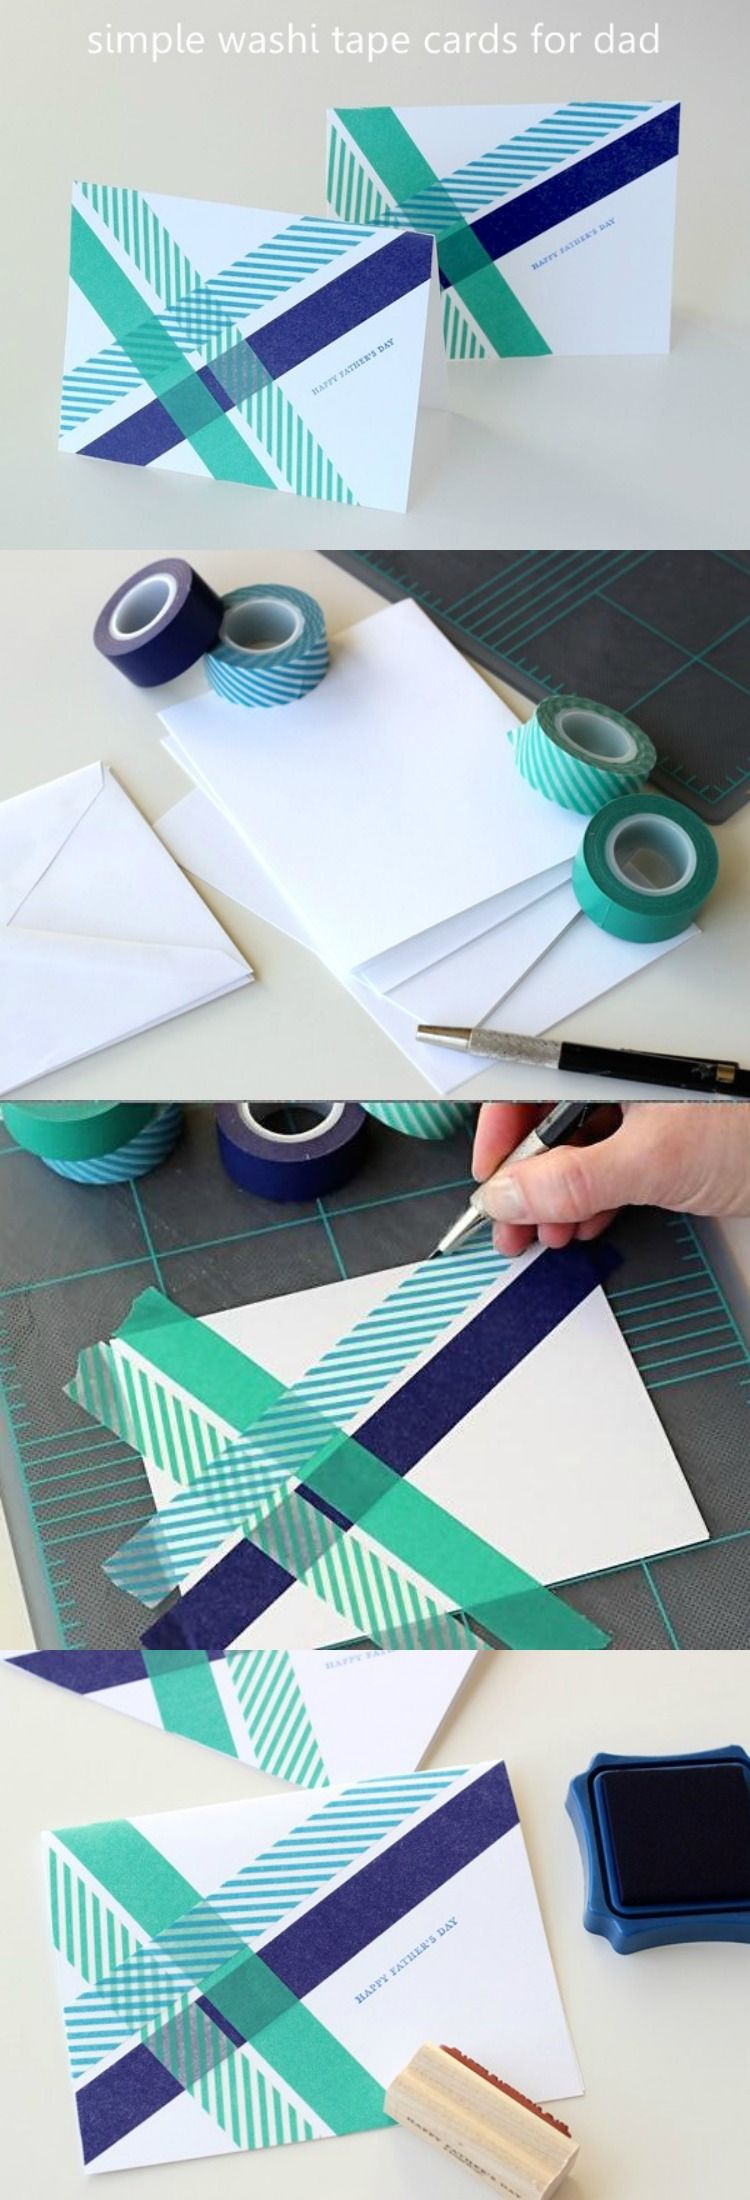 Card Making Ideas Using Washi Tape Part - 37: DIY Fatheru0027s Day Cards - Washi Tape Crafts